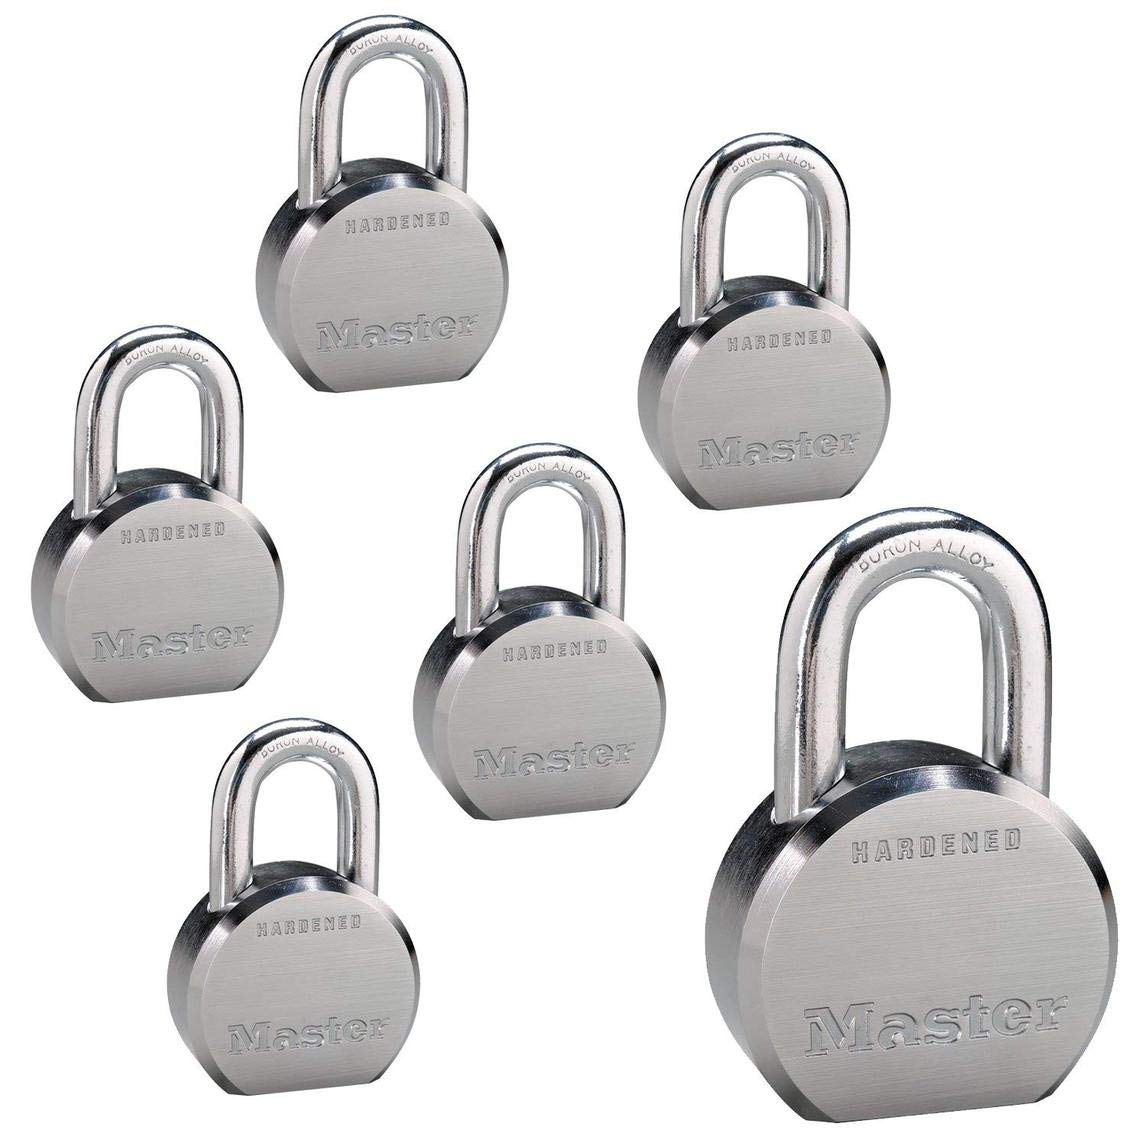 Master Lock - (6) High Security Pro Series Keyed Alike Padlocks 6230NKA-6 w/BumpStop Technology by Master Lock